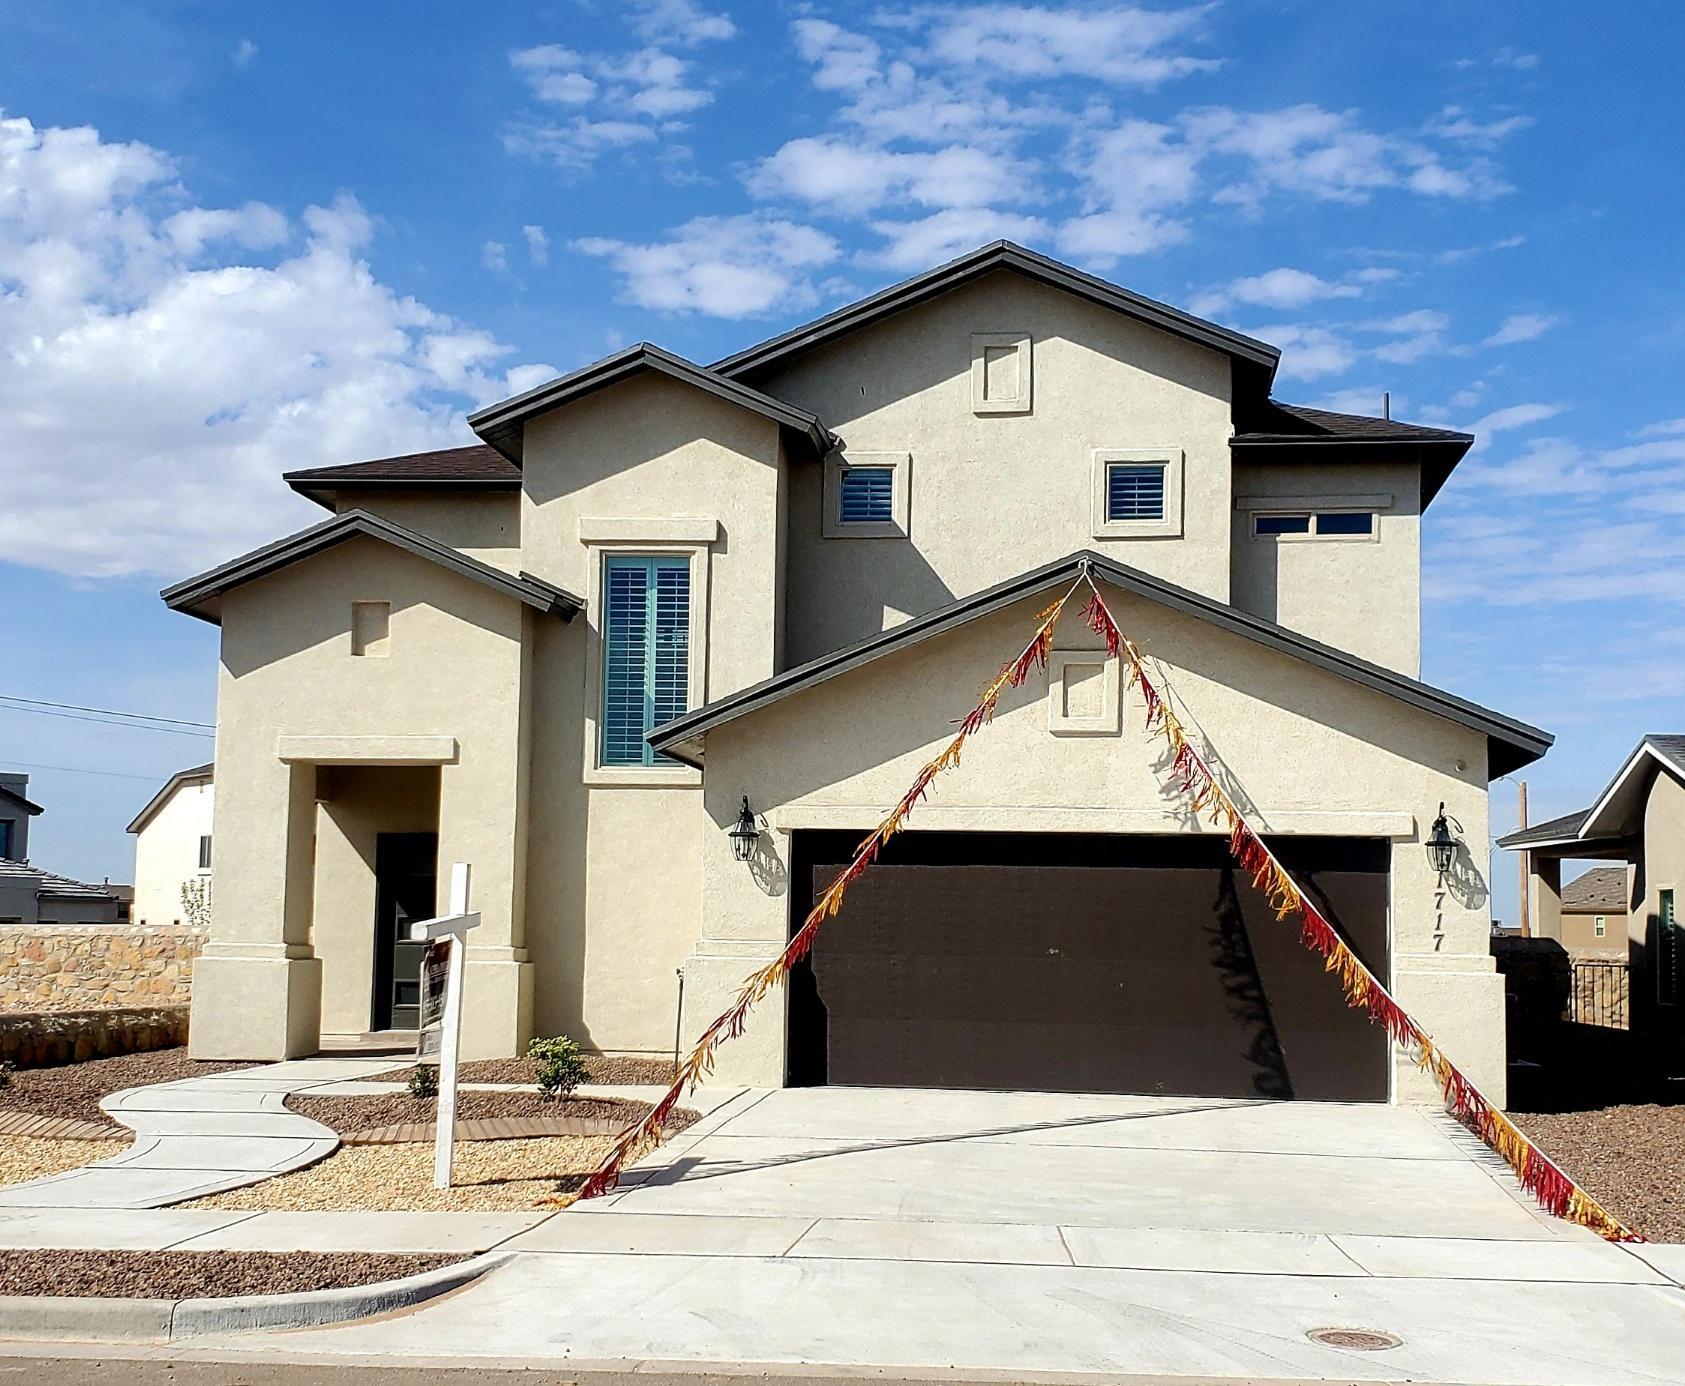 1717 Preakness, El Paso, Texas 79928, 4 Bedrooms Bedrooms, ,3 BathroomsBathrooms,Residential,For sale,Preakness,813333